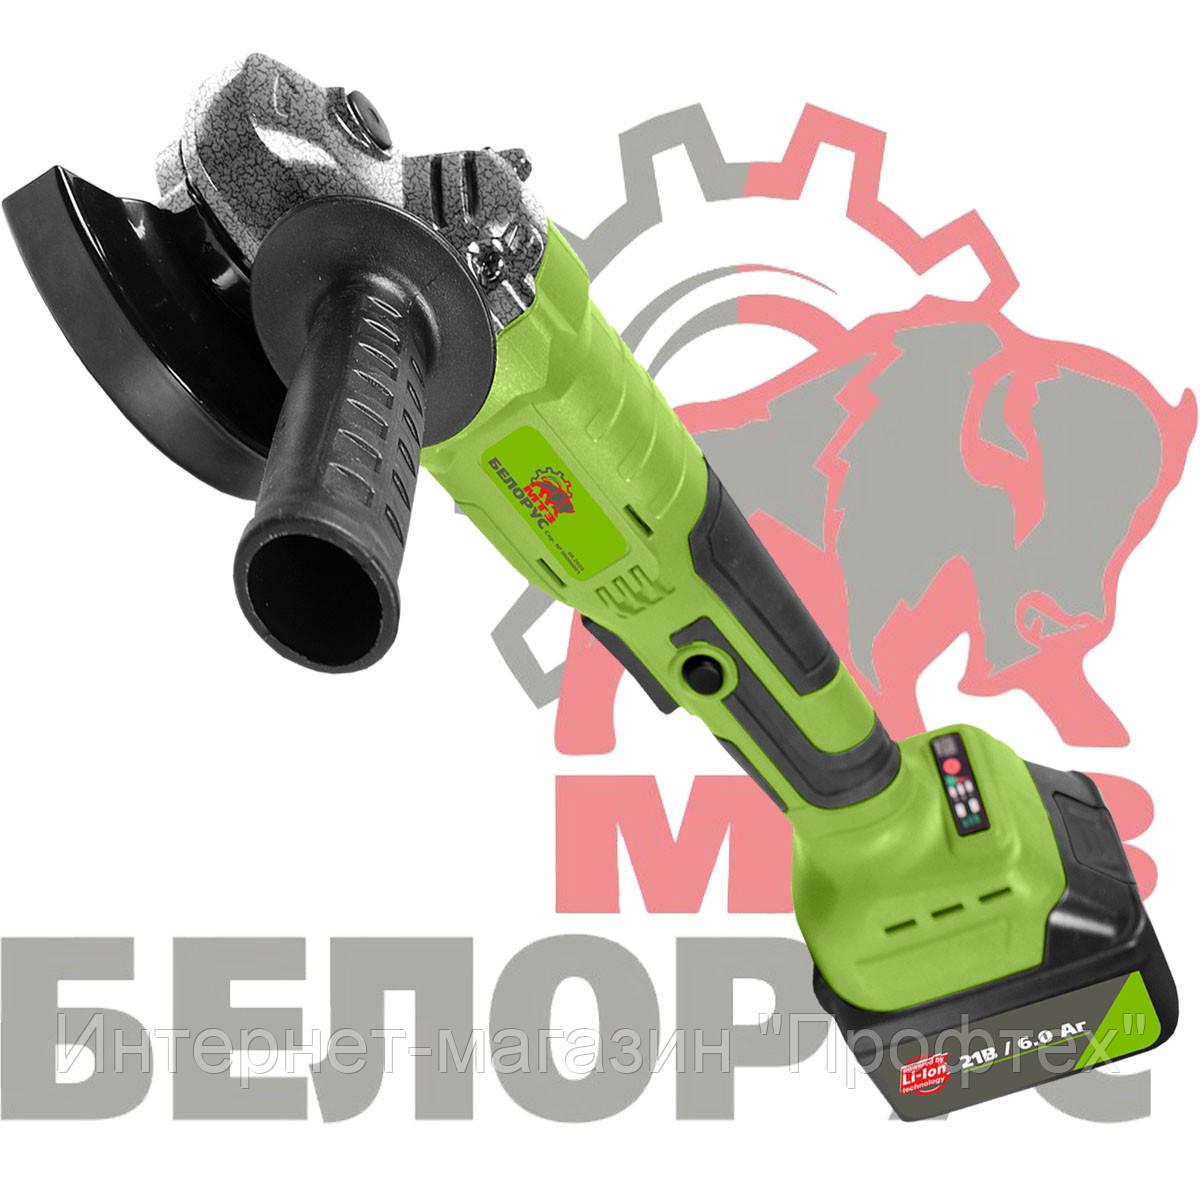 Аккумуляторная угловая шлиф-машина Белорус МШУ 125/21